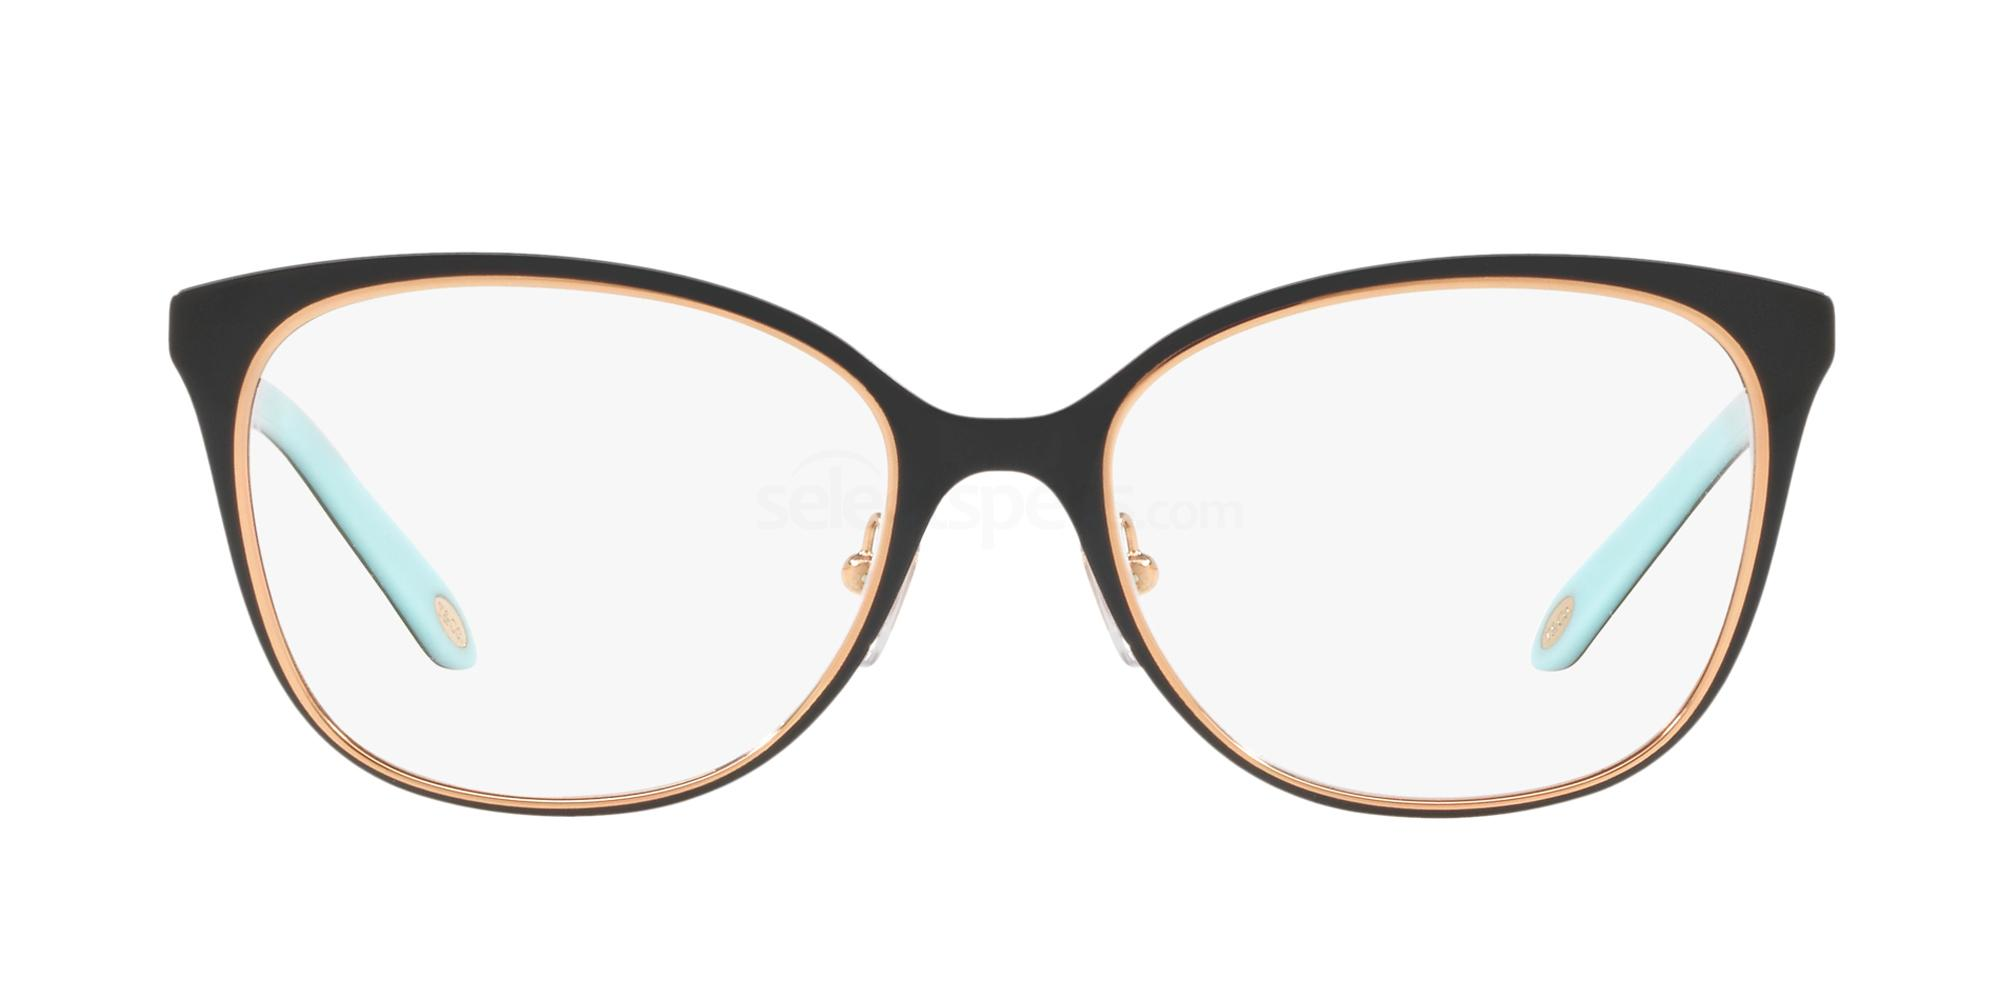 6127 TF1130 Glasses, Tiffany & Co.